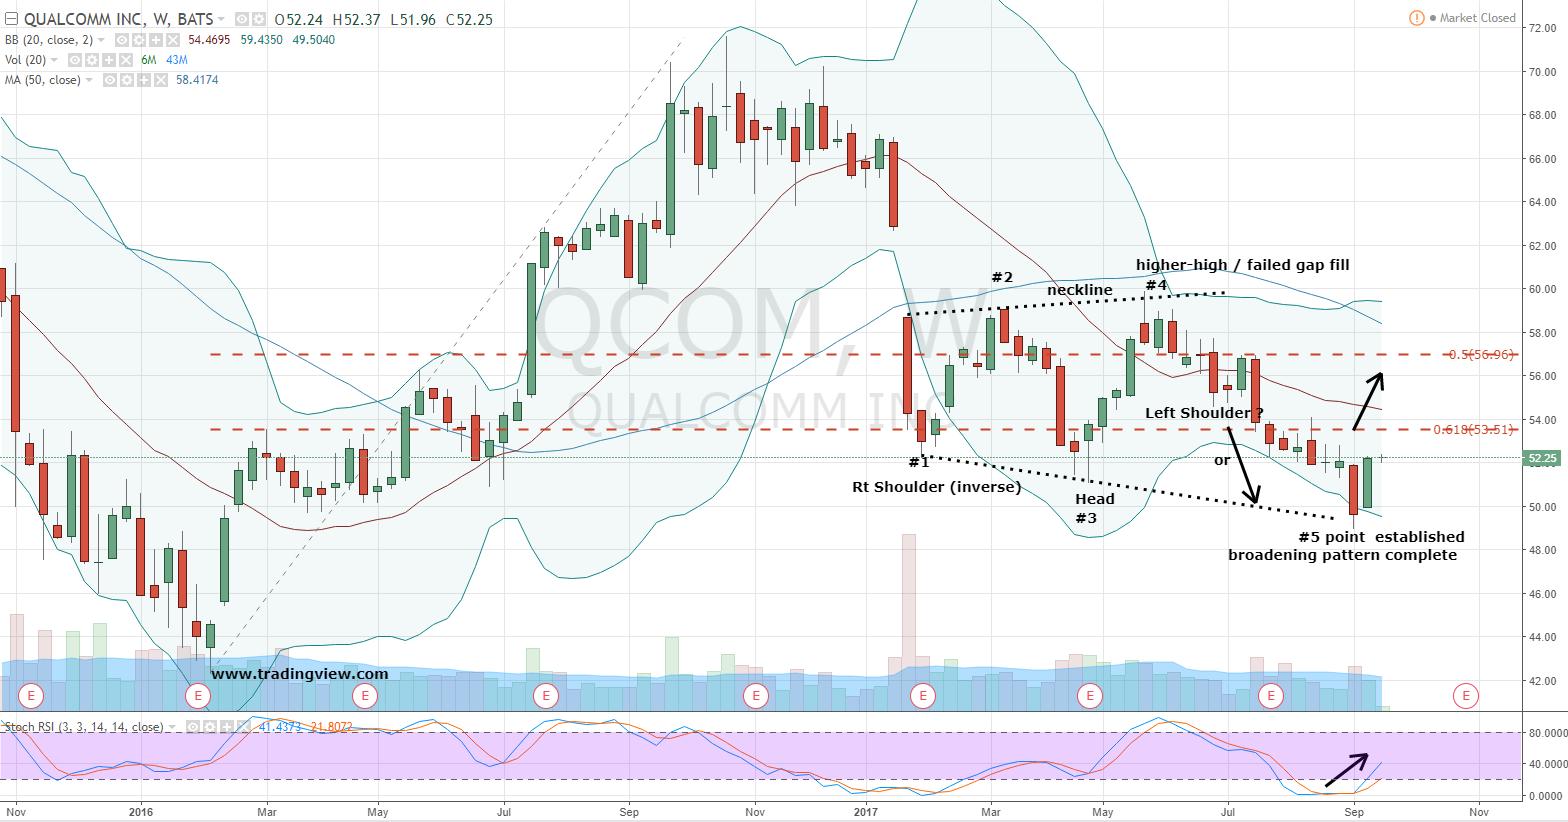 QUALCOMM Incorporated (NASDAQ:QCOM) 52 Week High stands at 71.62